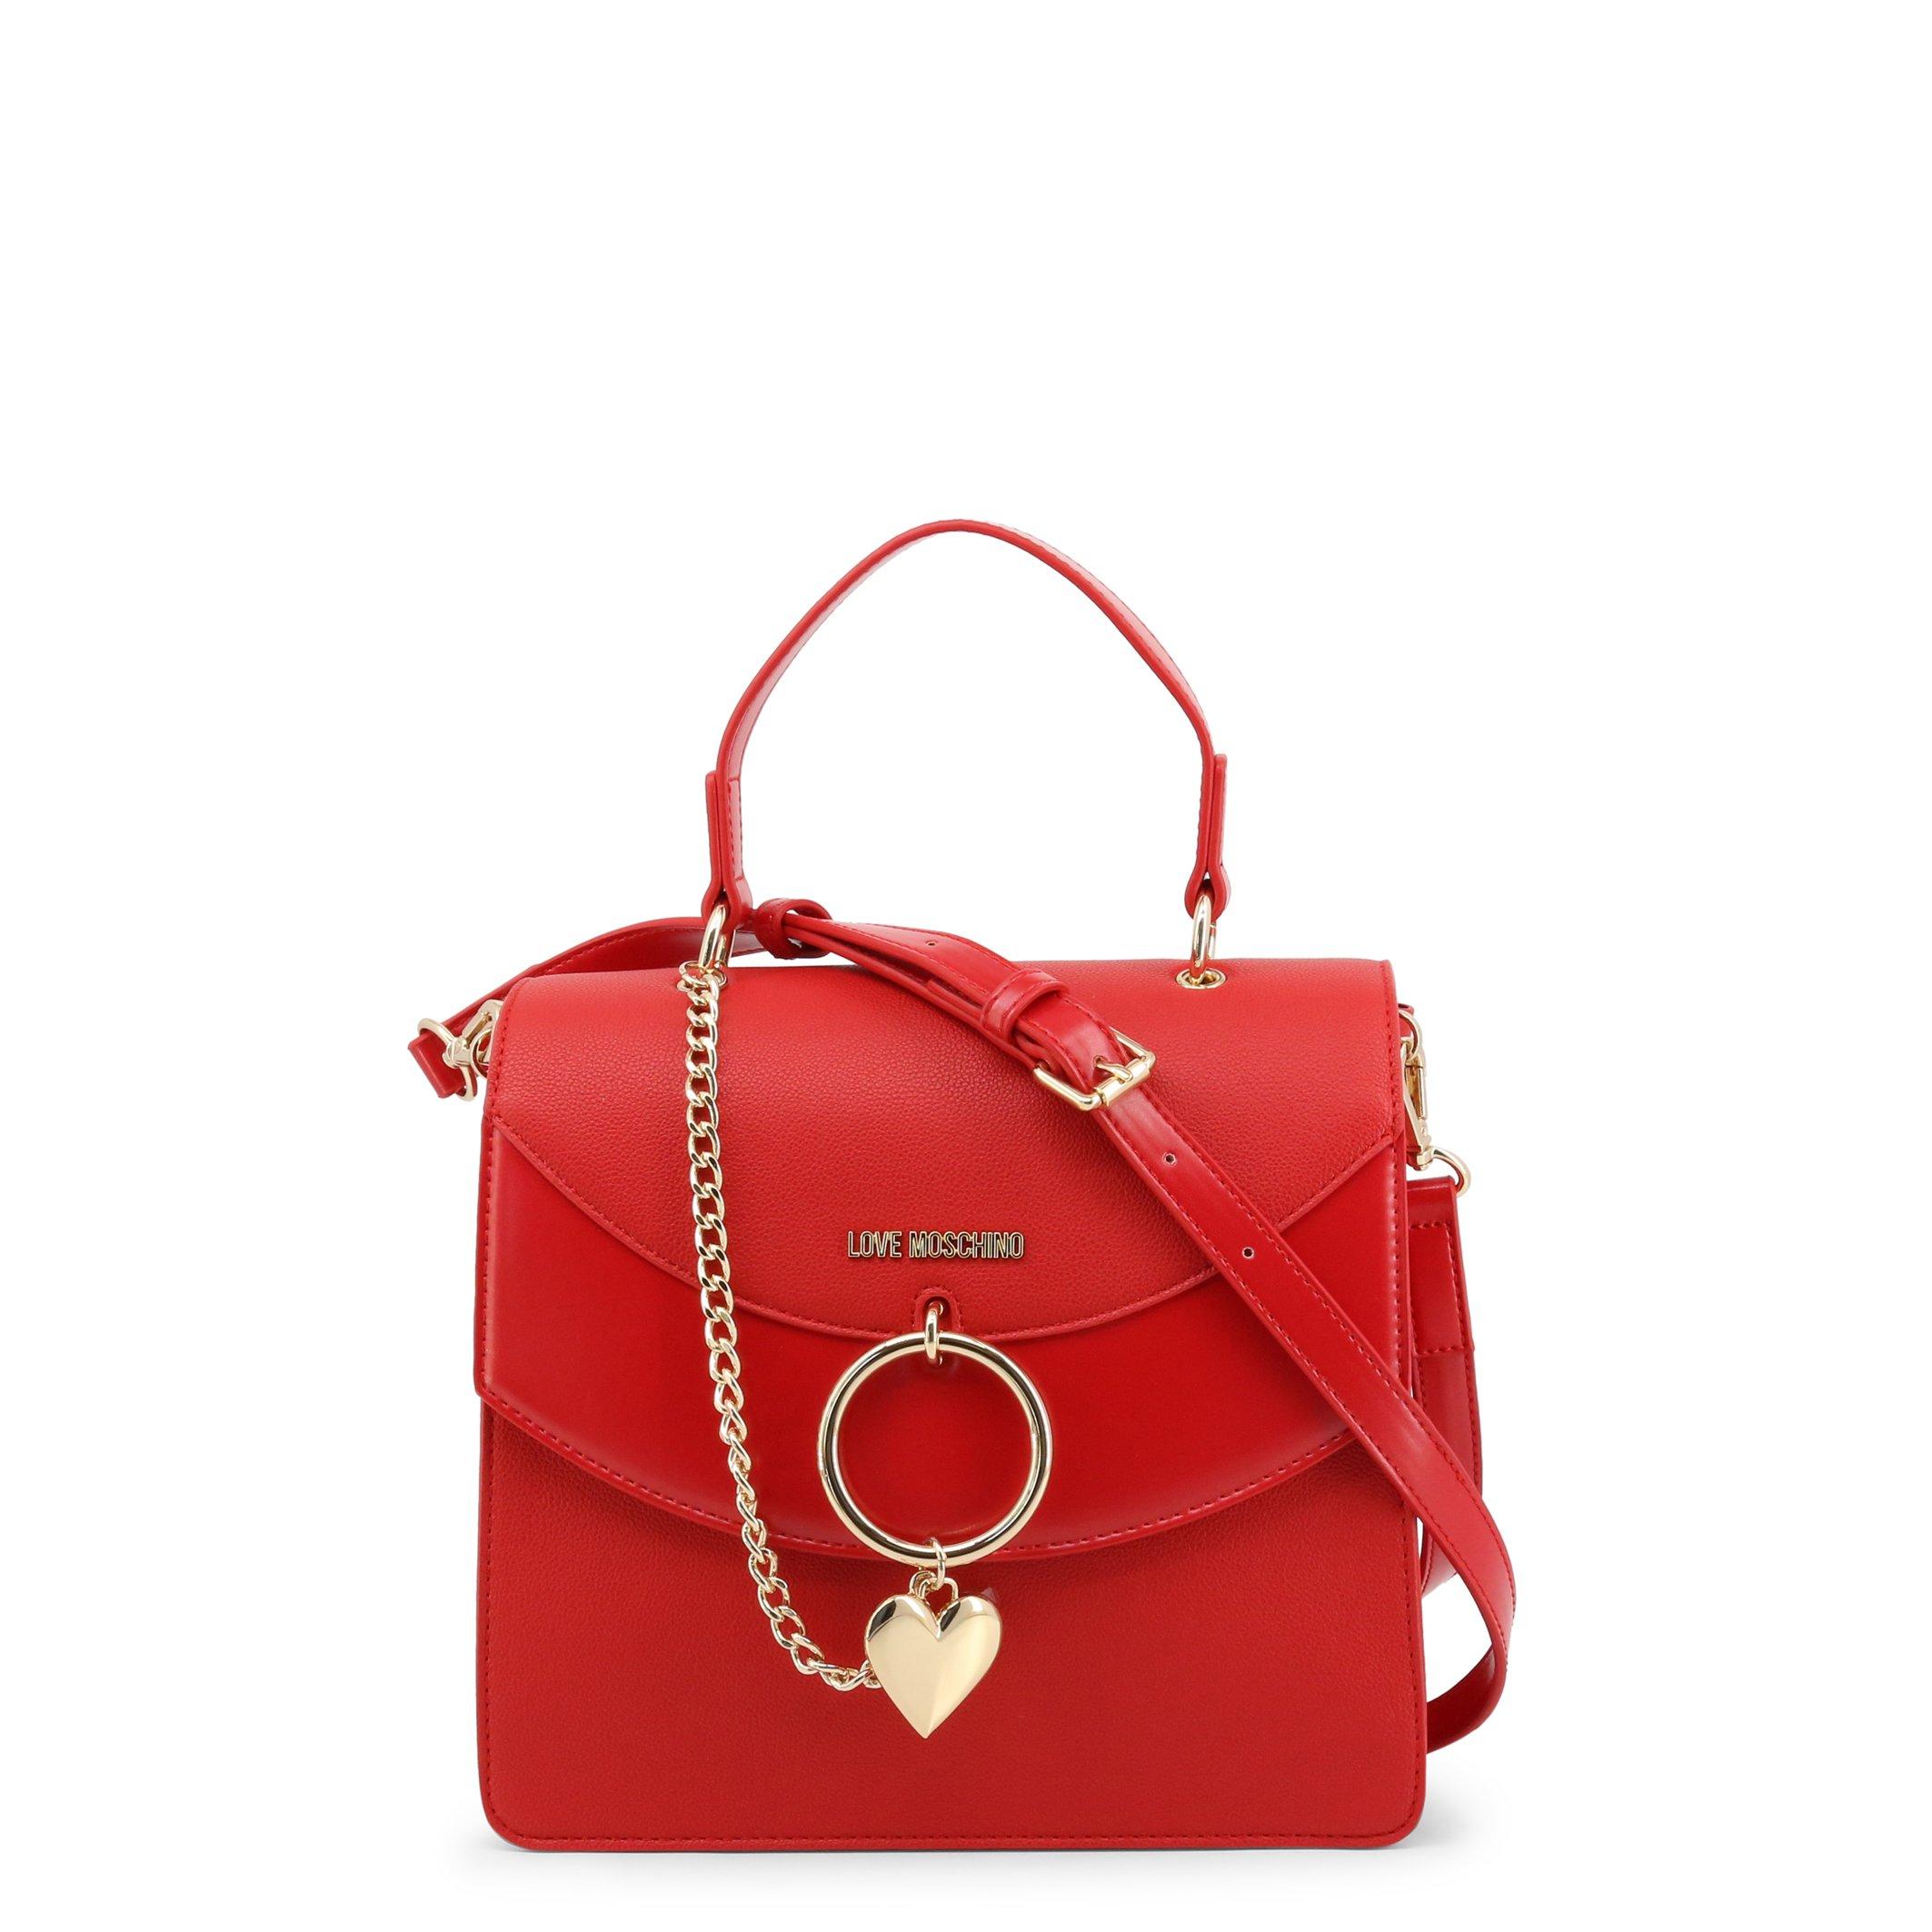 Love Moschino Women's Handbag Various Colours JC4238PP0CKF1 - red NOSIZE